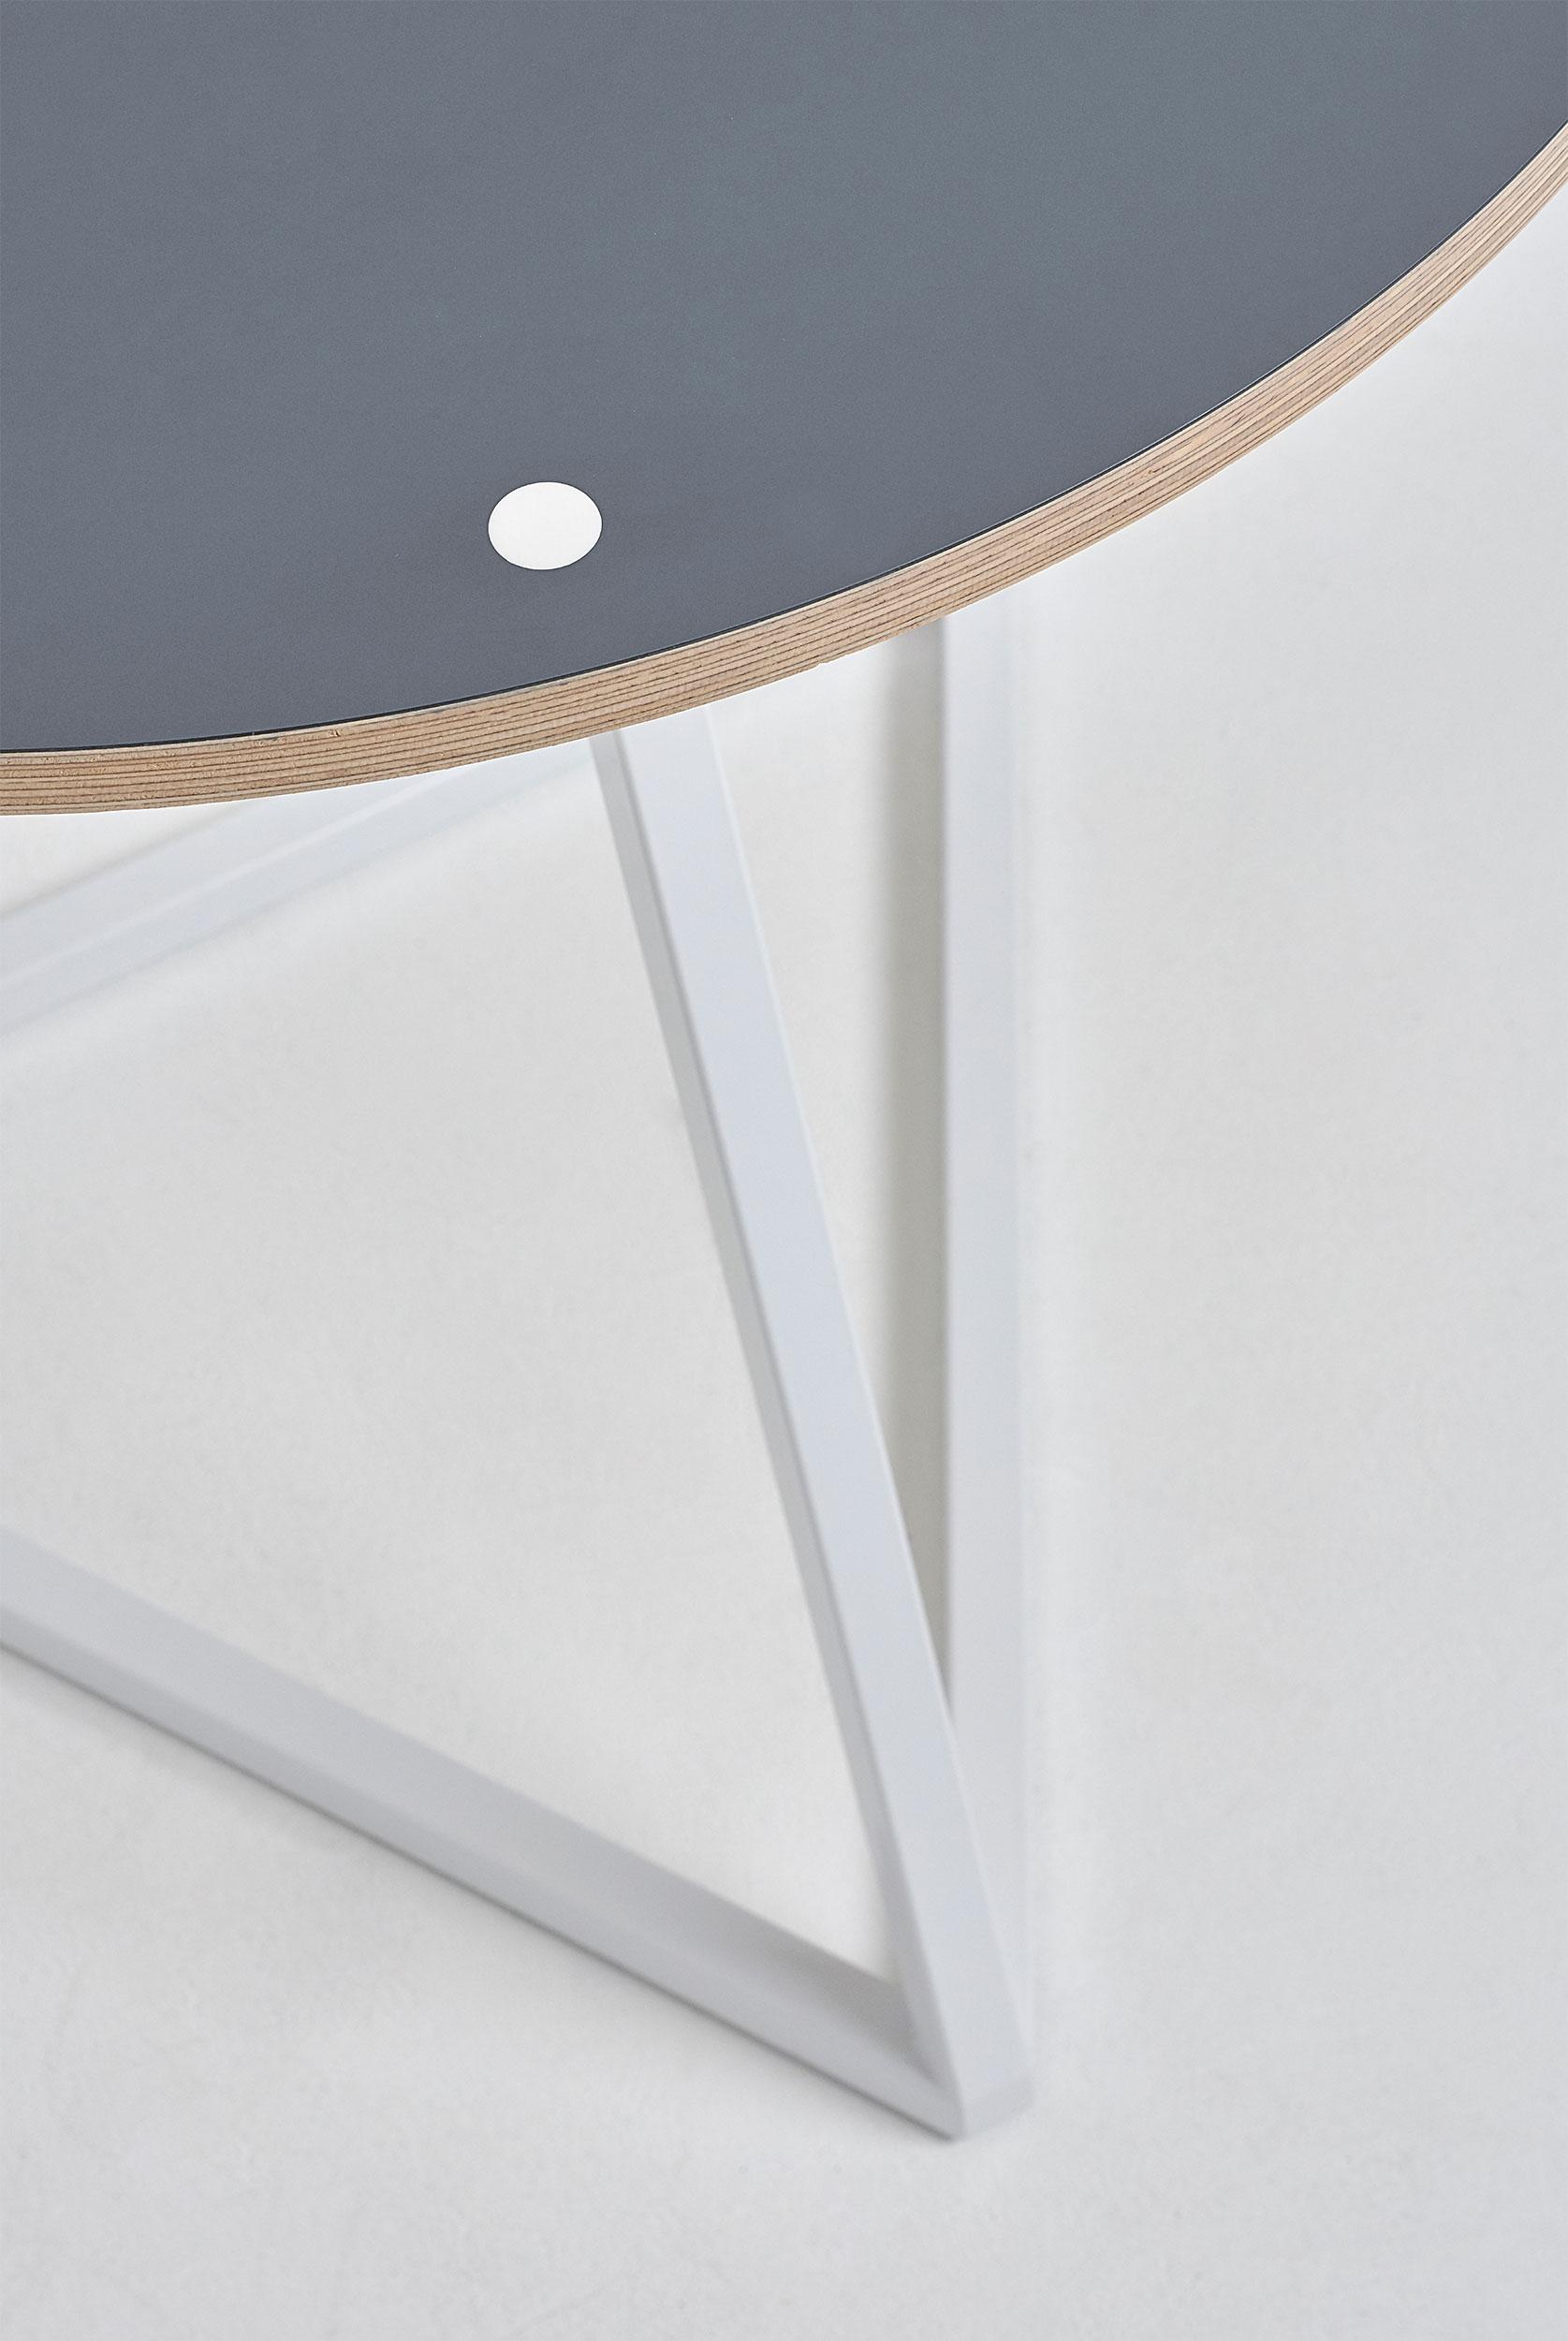 circular-multi-table-close-up